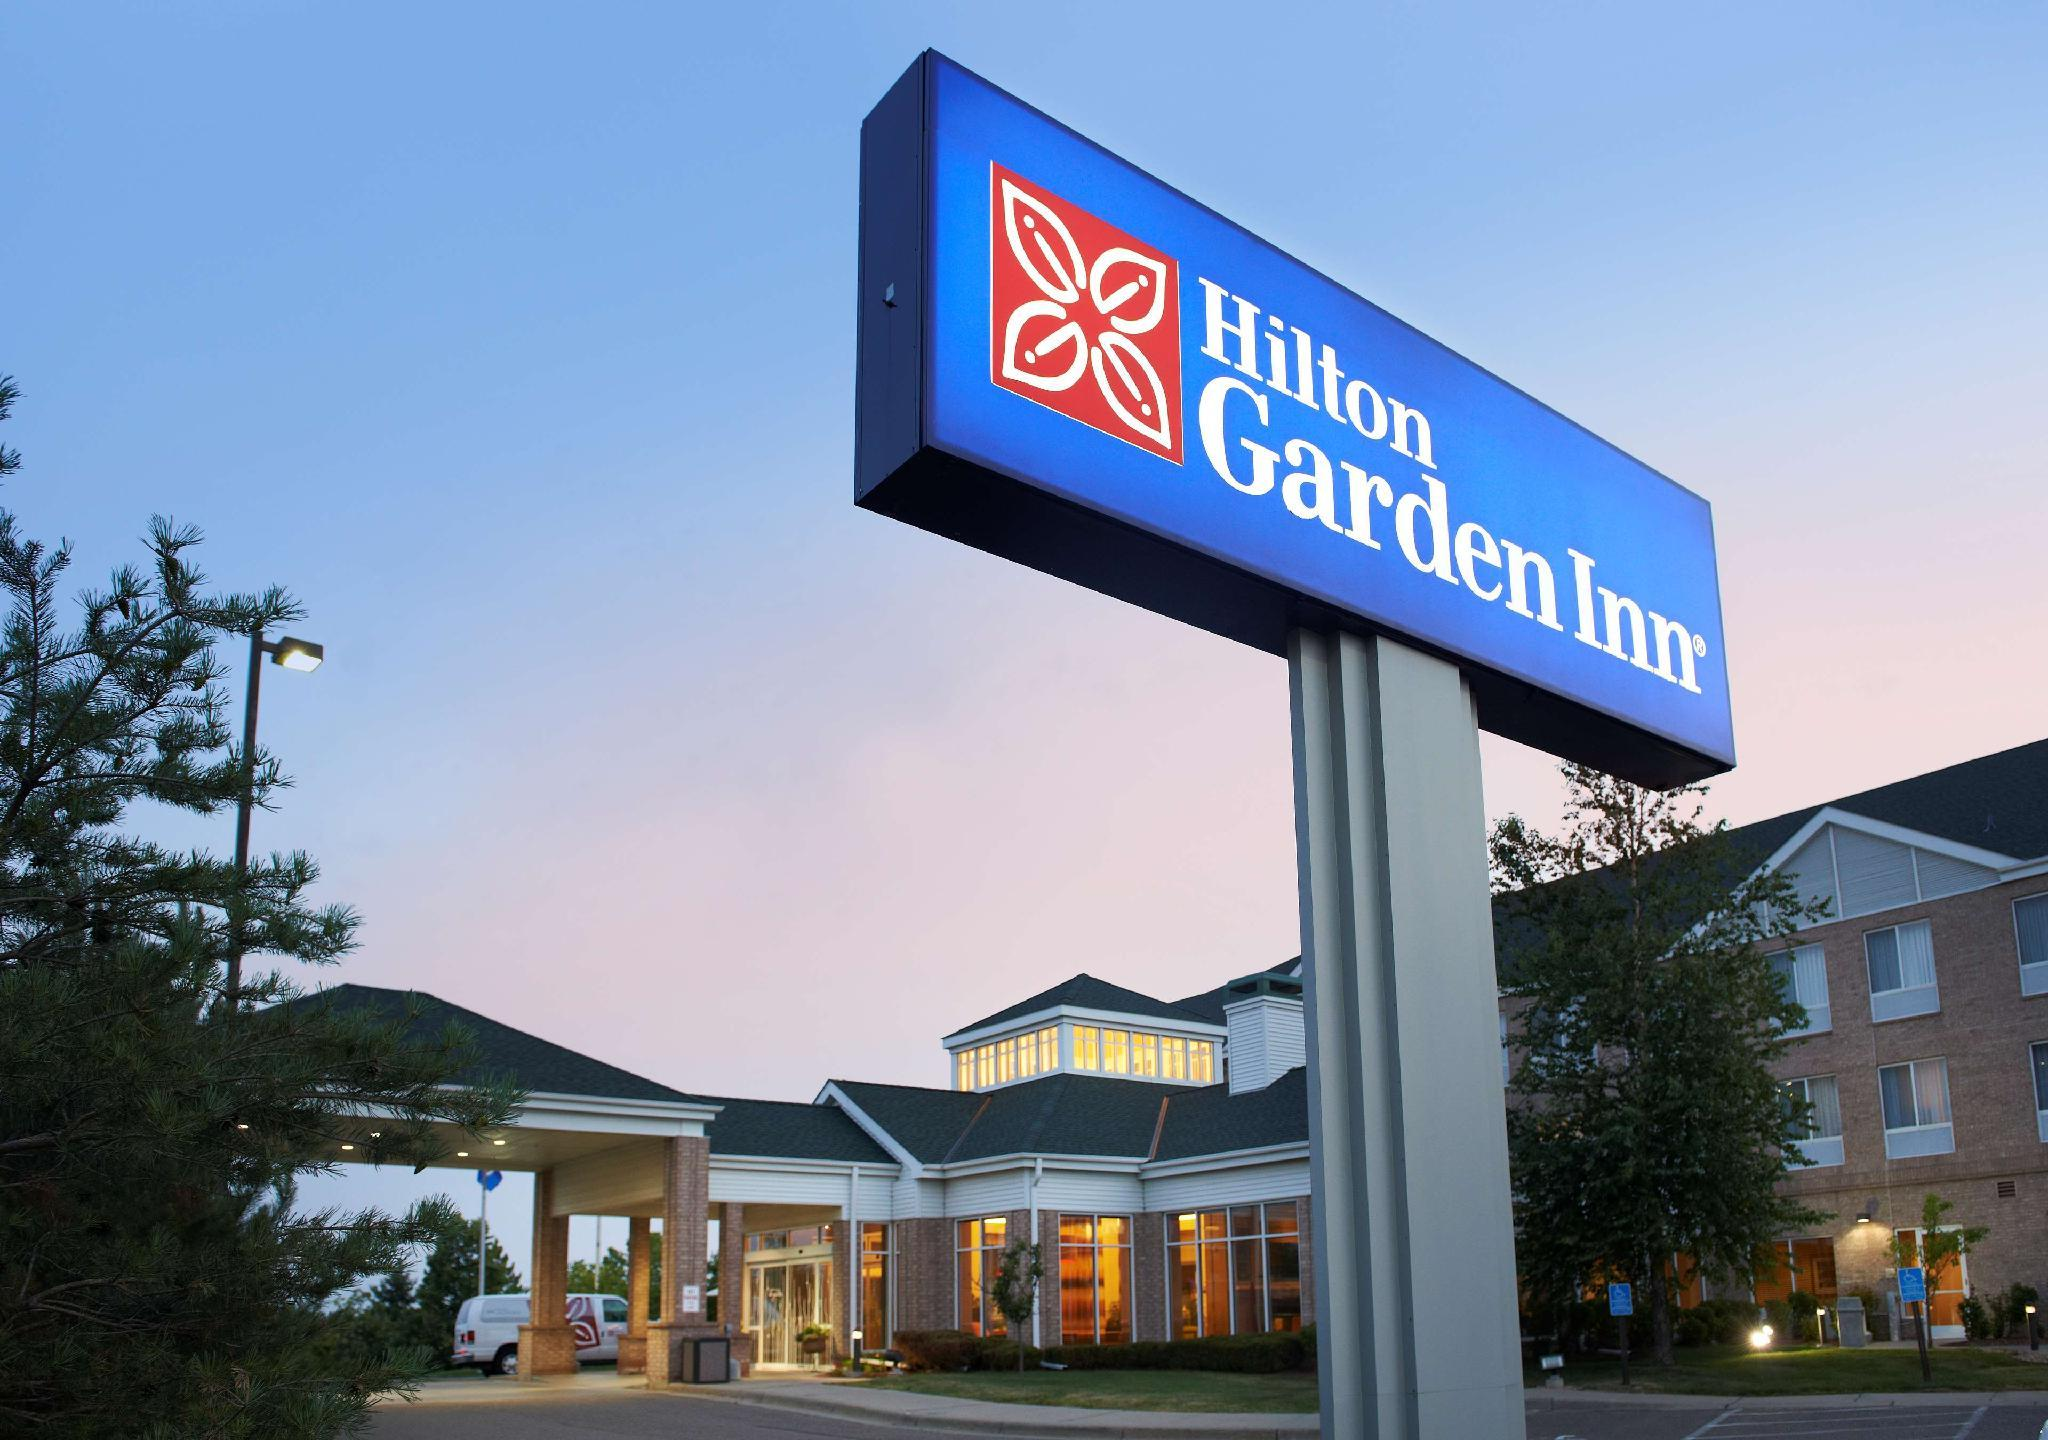 Hilton Garden Inn Minneapolis Eden Prairie